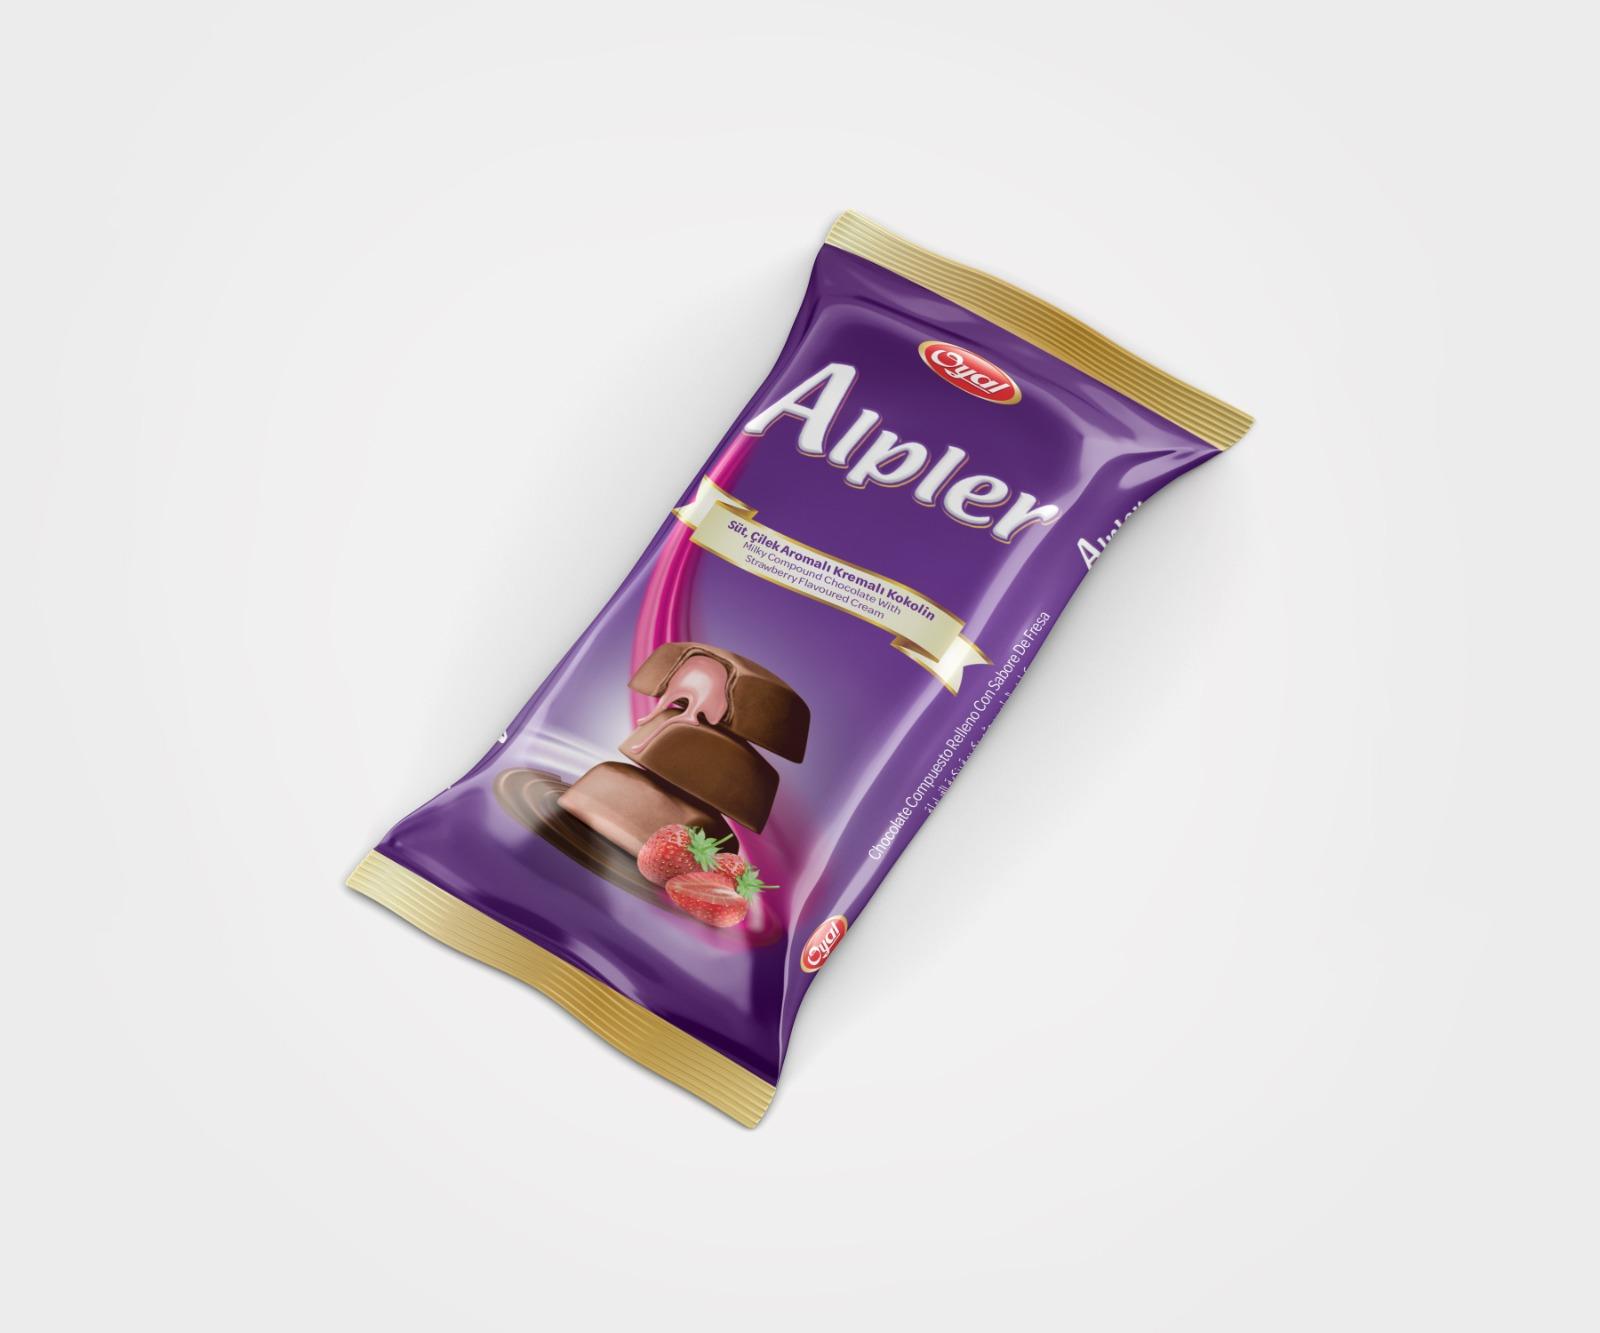 ALPLER TABLET CHOCOLATE FILLED WITH CREAM 45GR